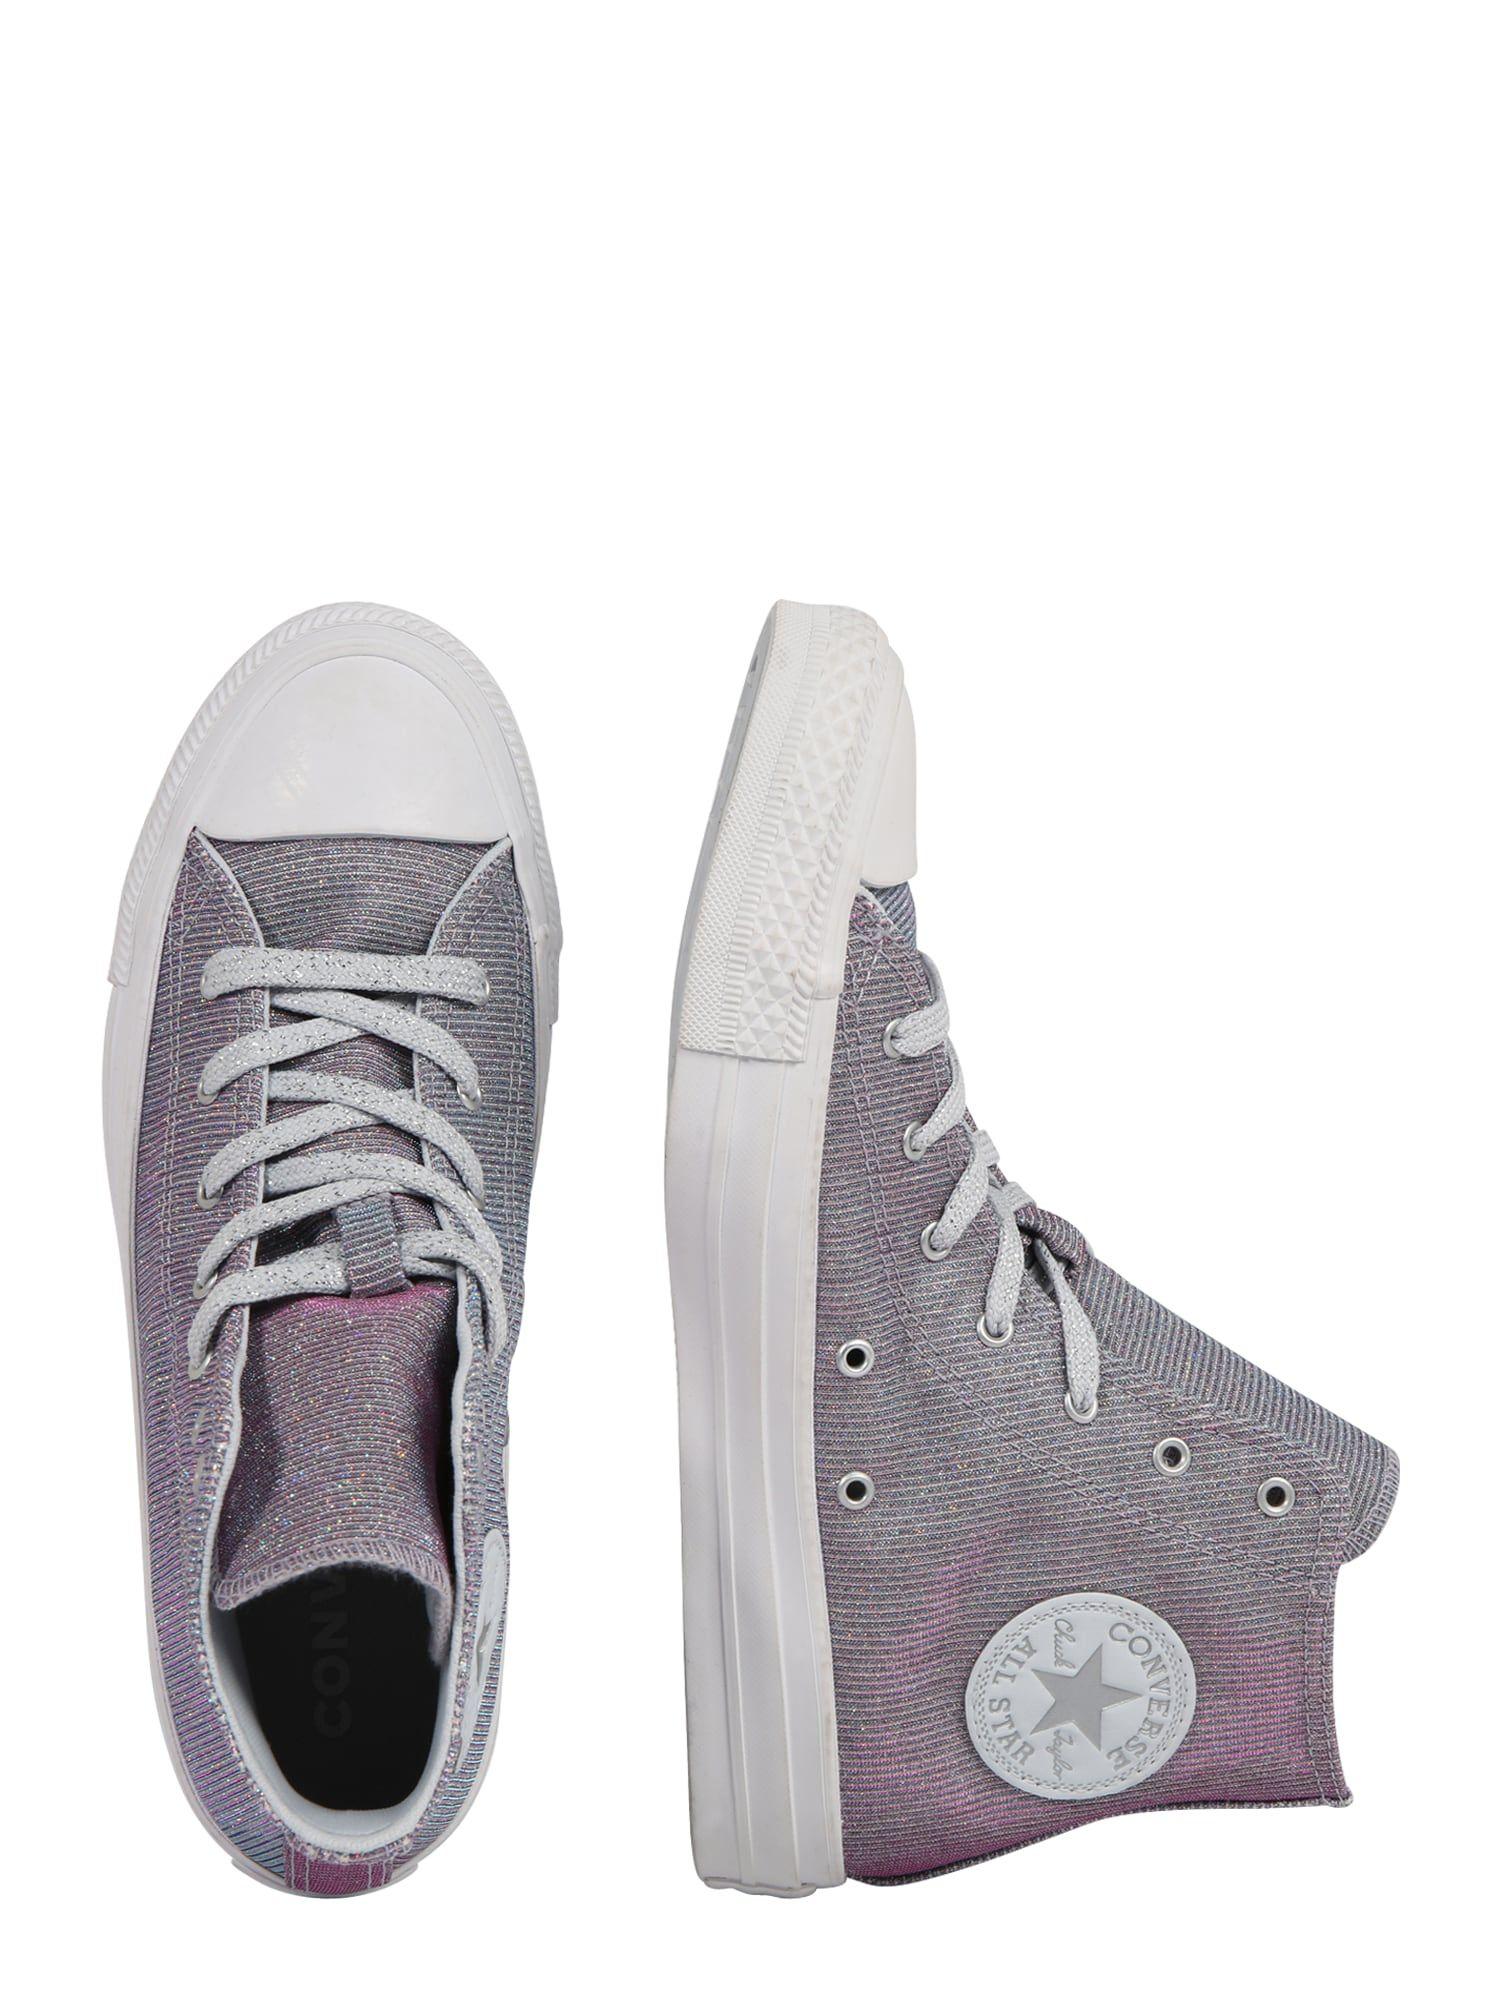 CONVERSE Sneaker 'CHUCK TAYLOR ALL STAR STARWARE HI' Damen